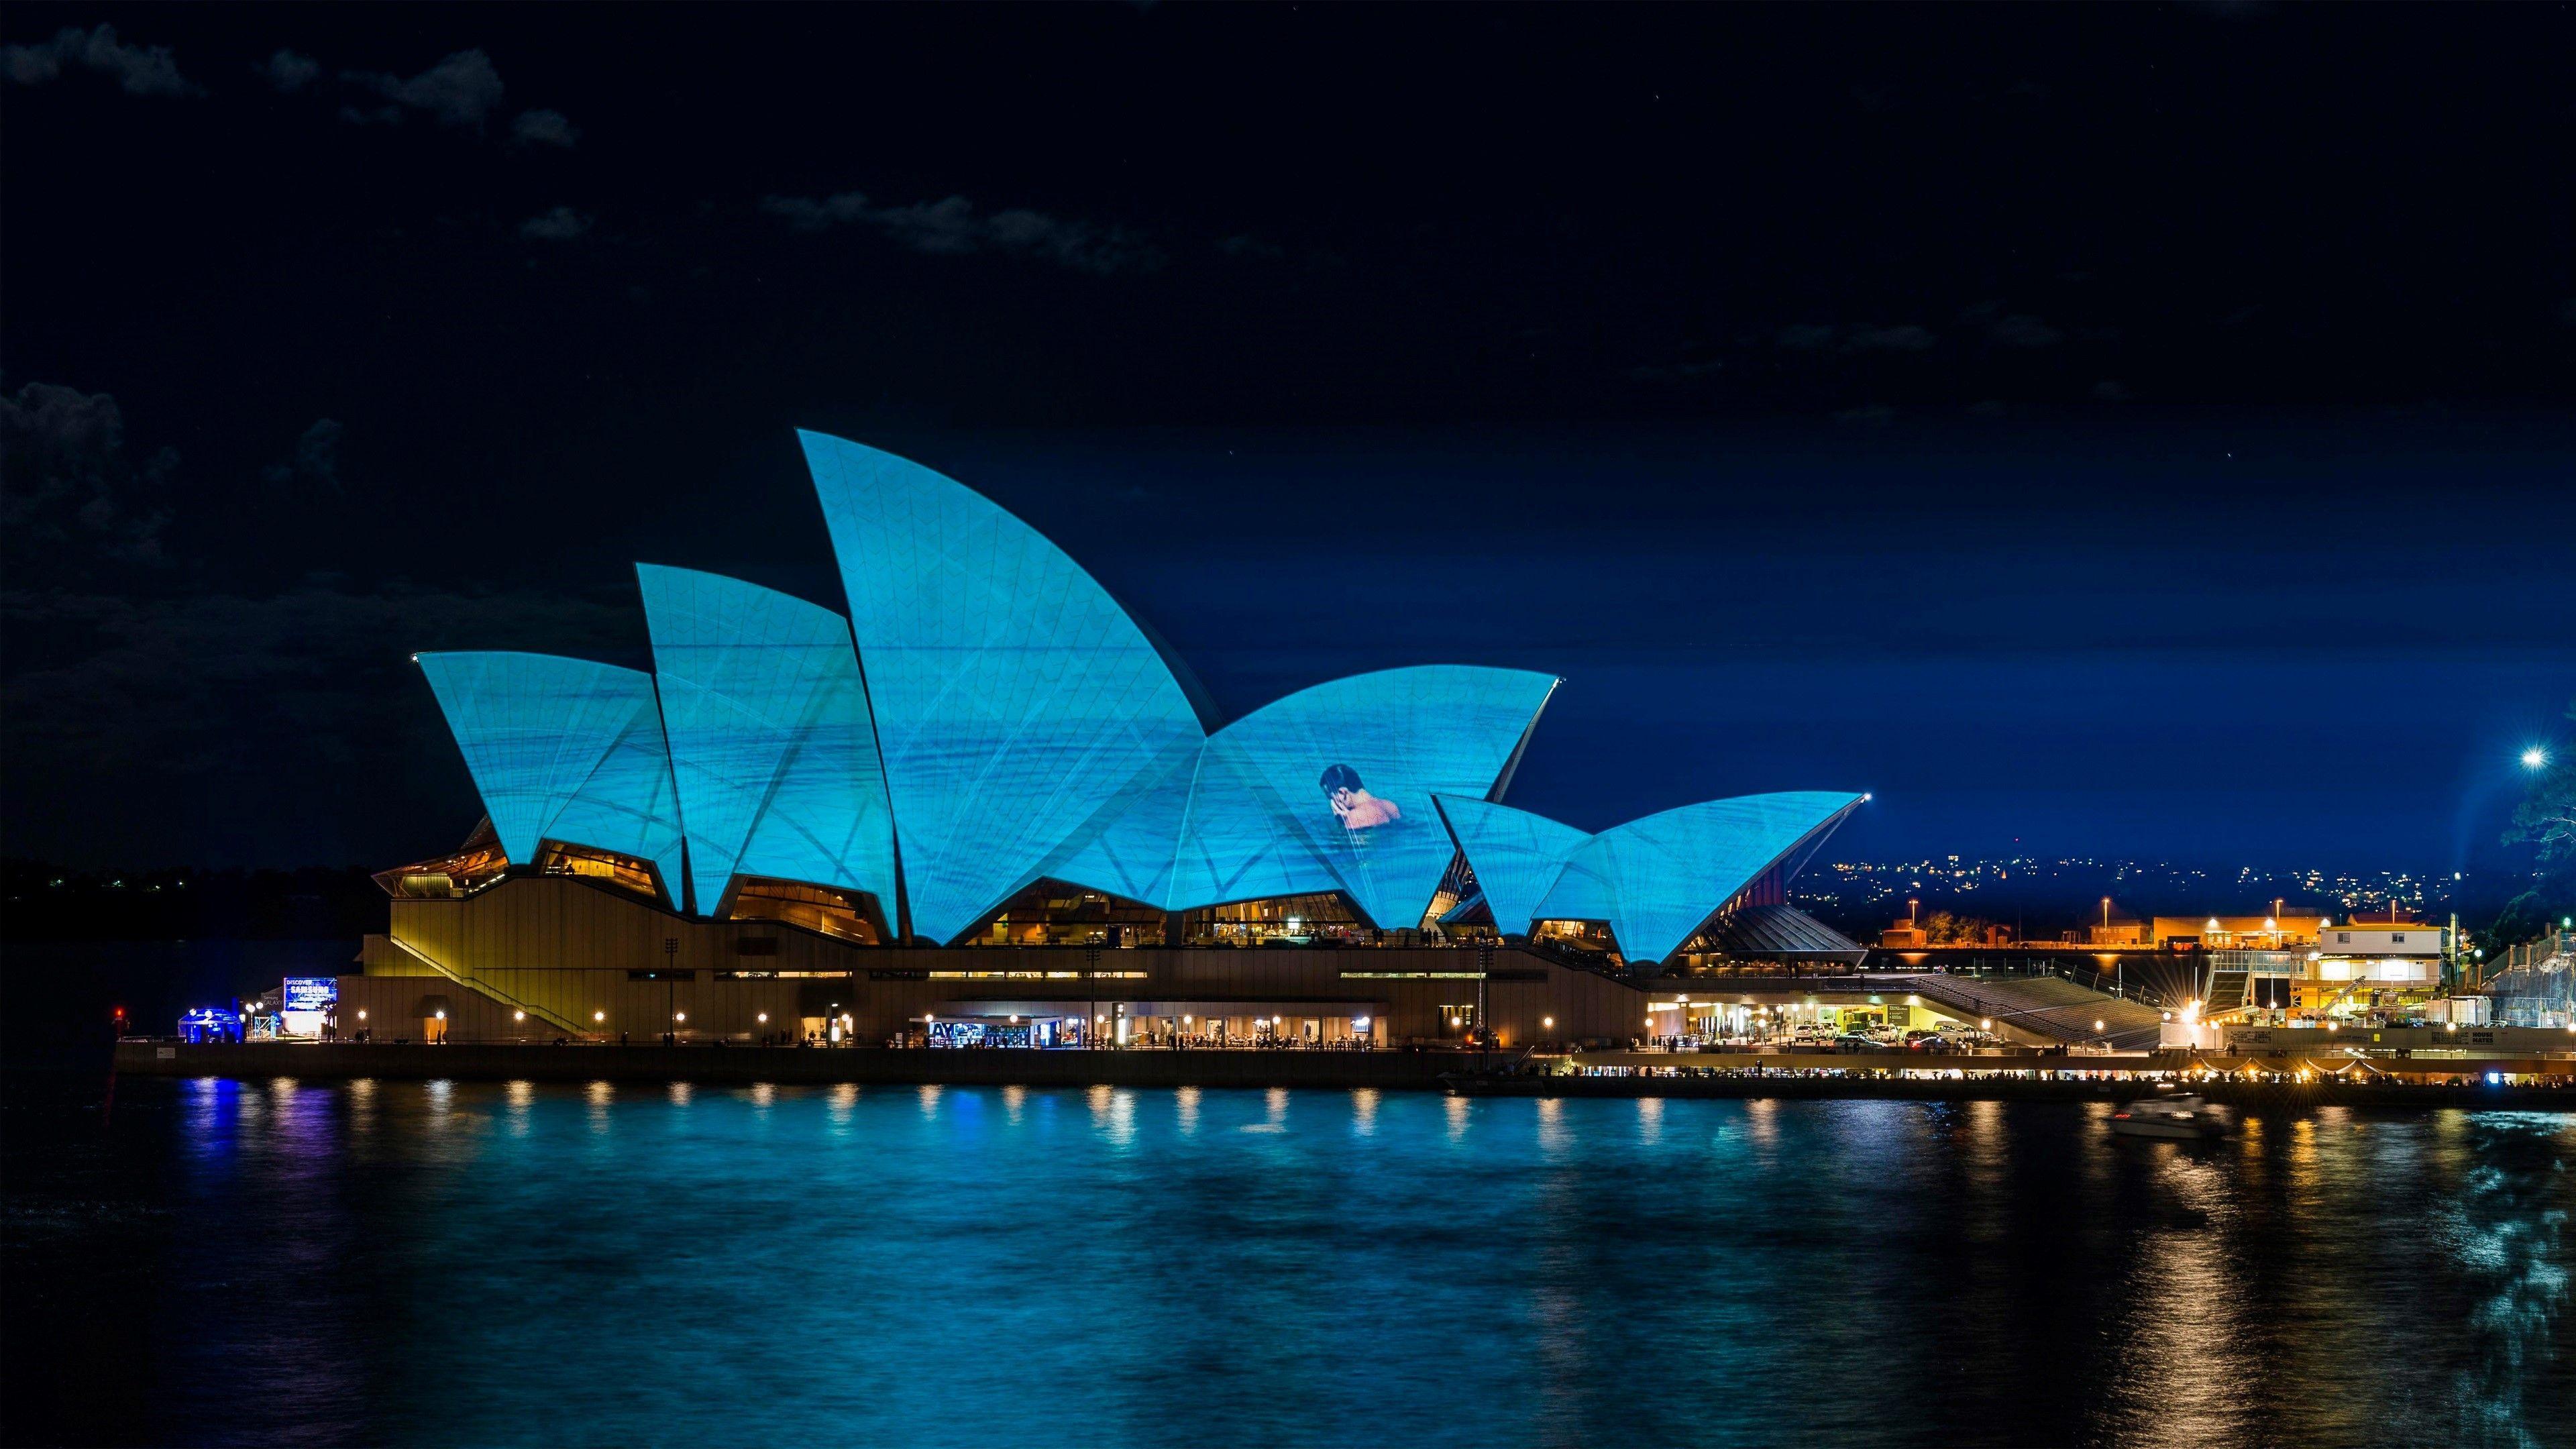 Sydney 4k Wallpapers Top Free Sydney 4k Backgrounds